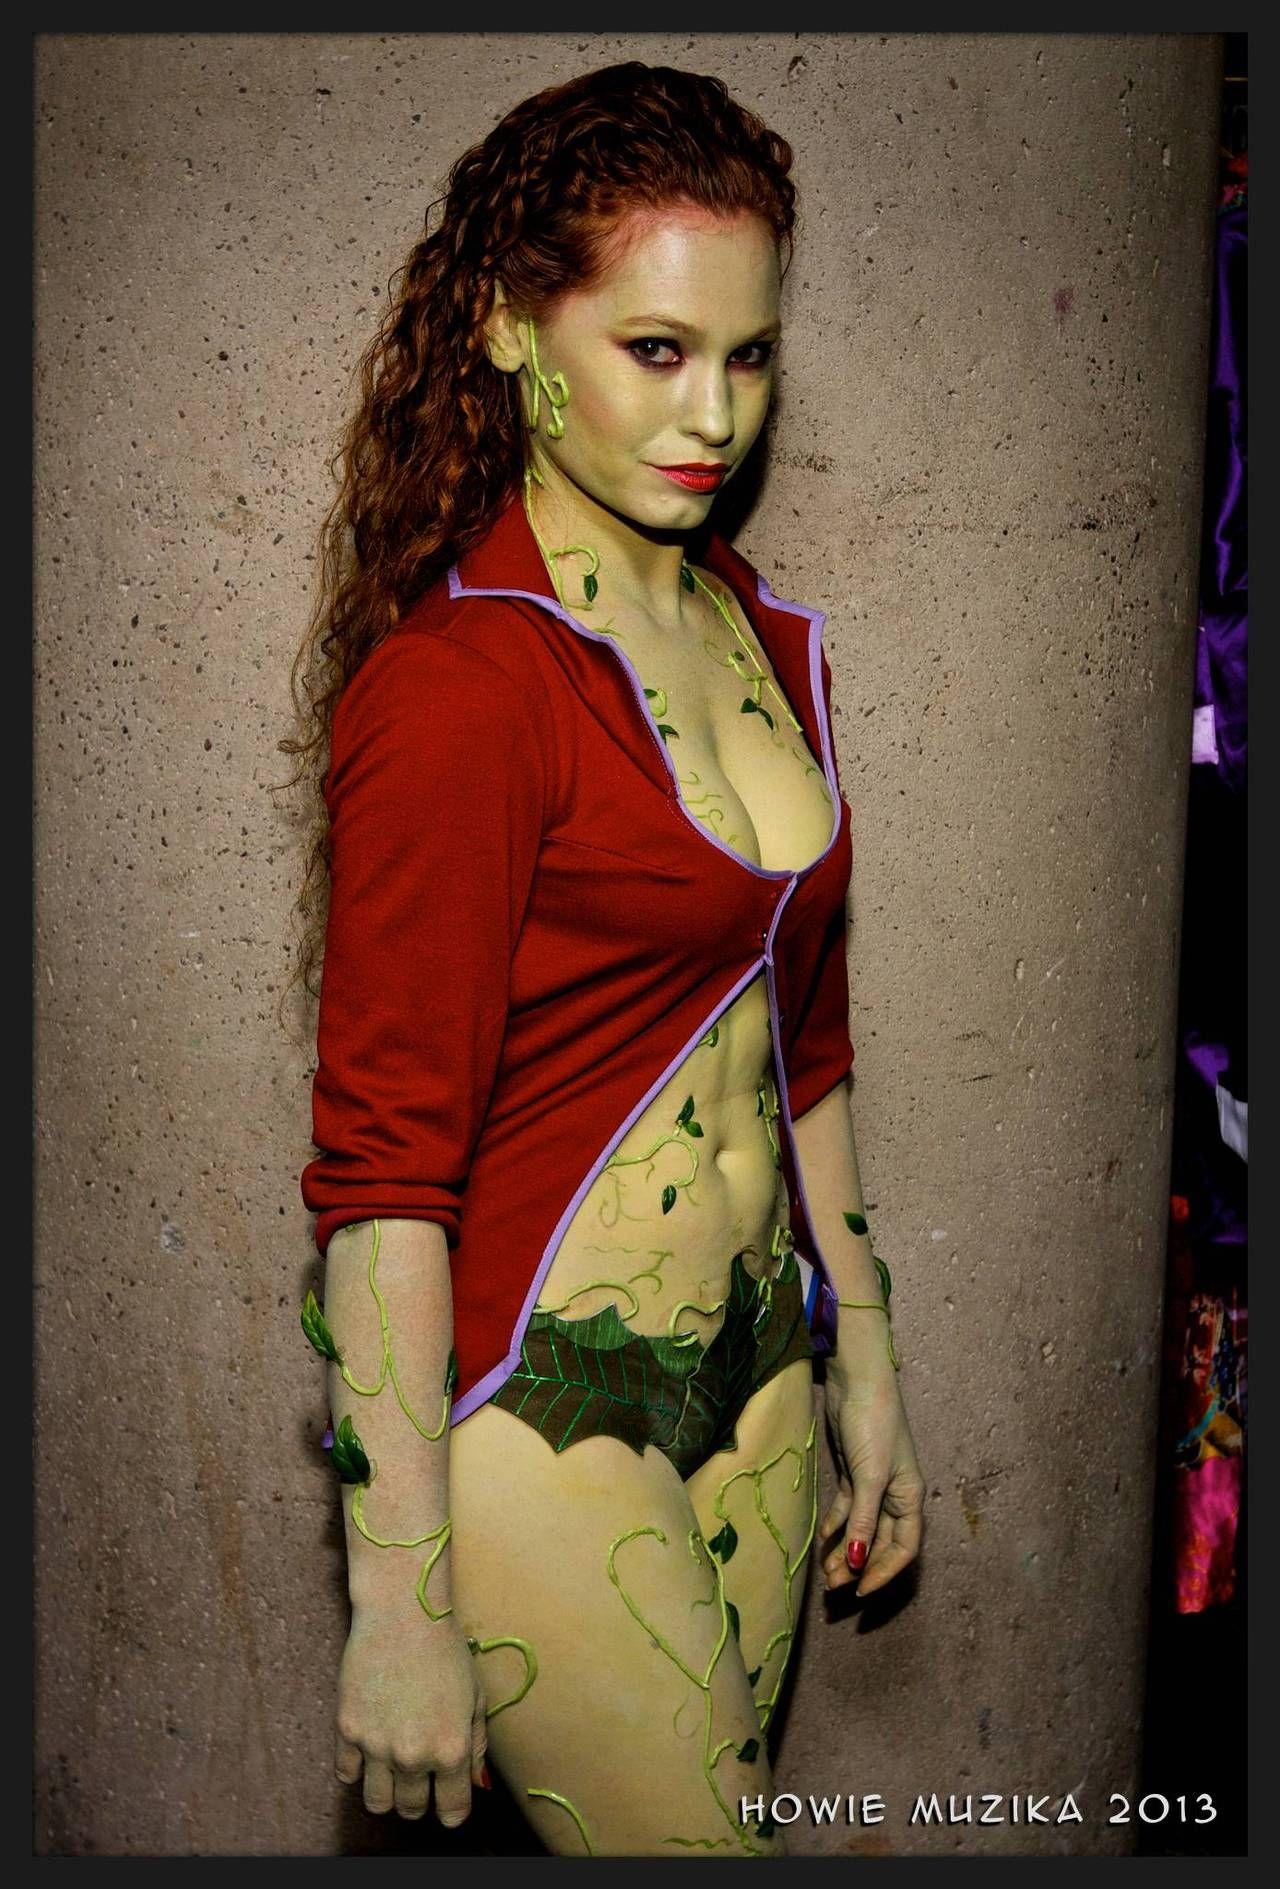 Poison Ivy from Arkham Asylum, photo by Howie Muzika ...